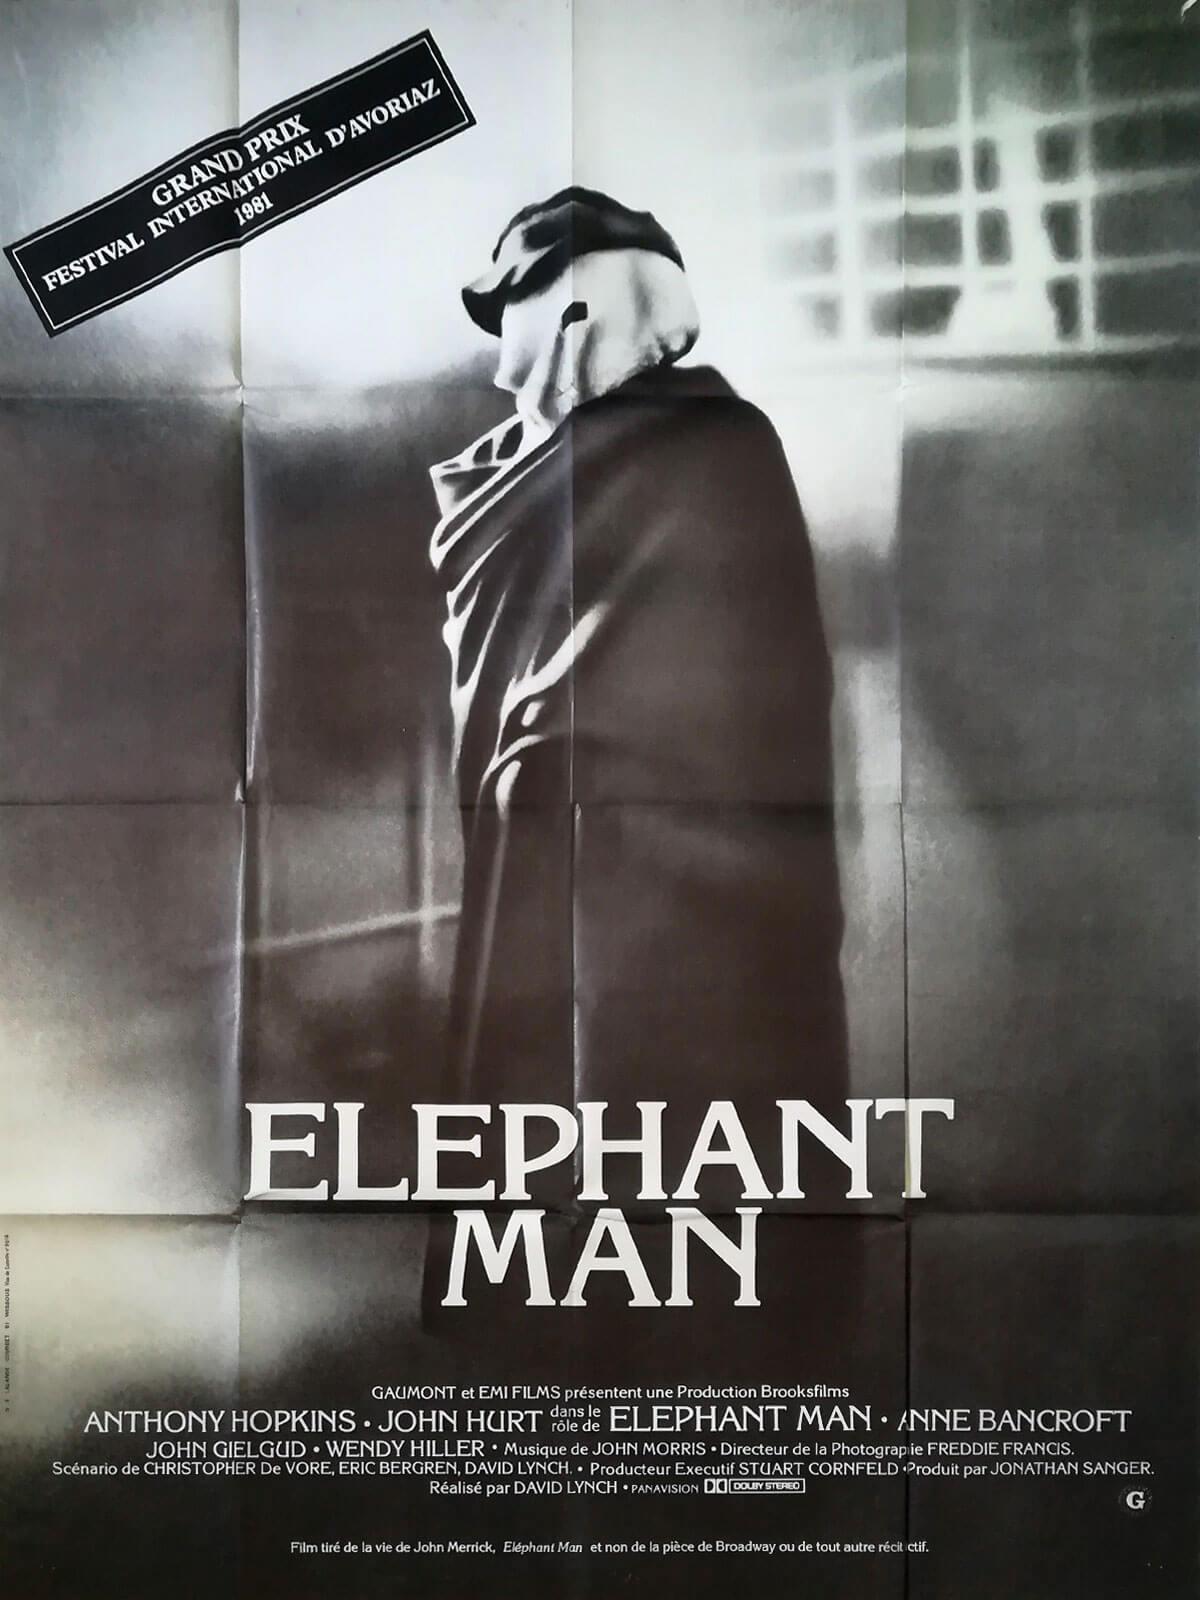 The Elephant Man, 1980